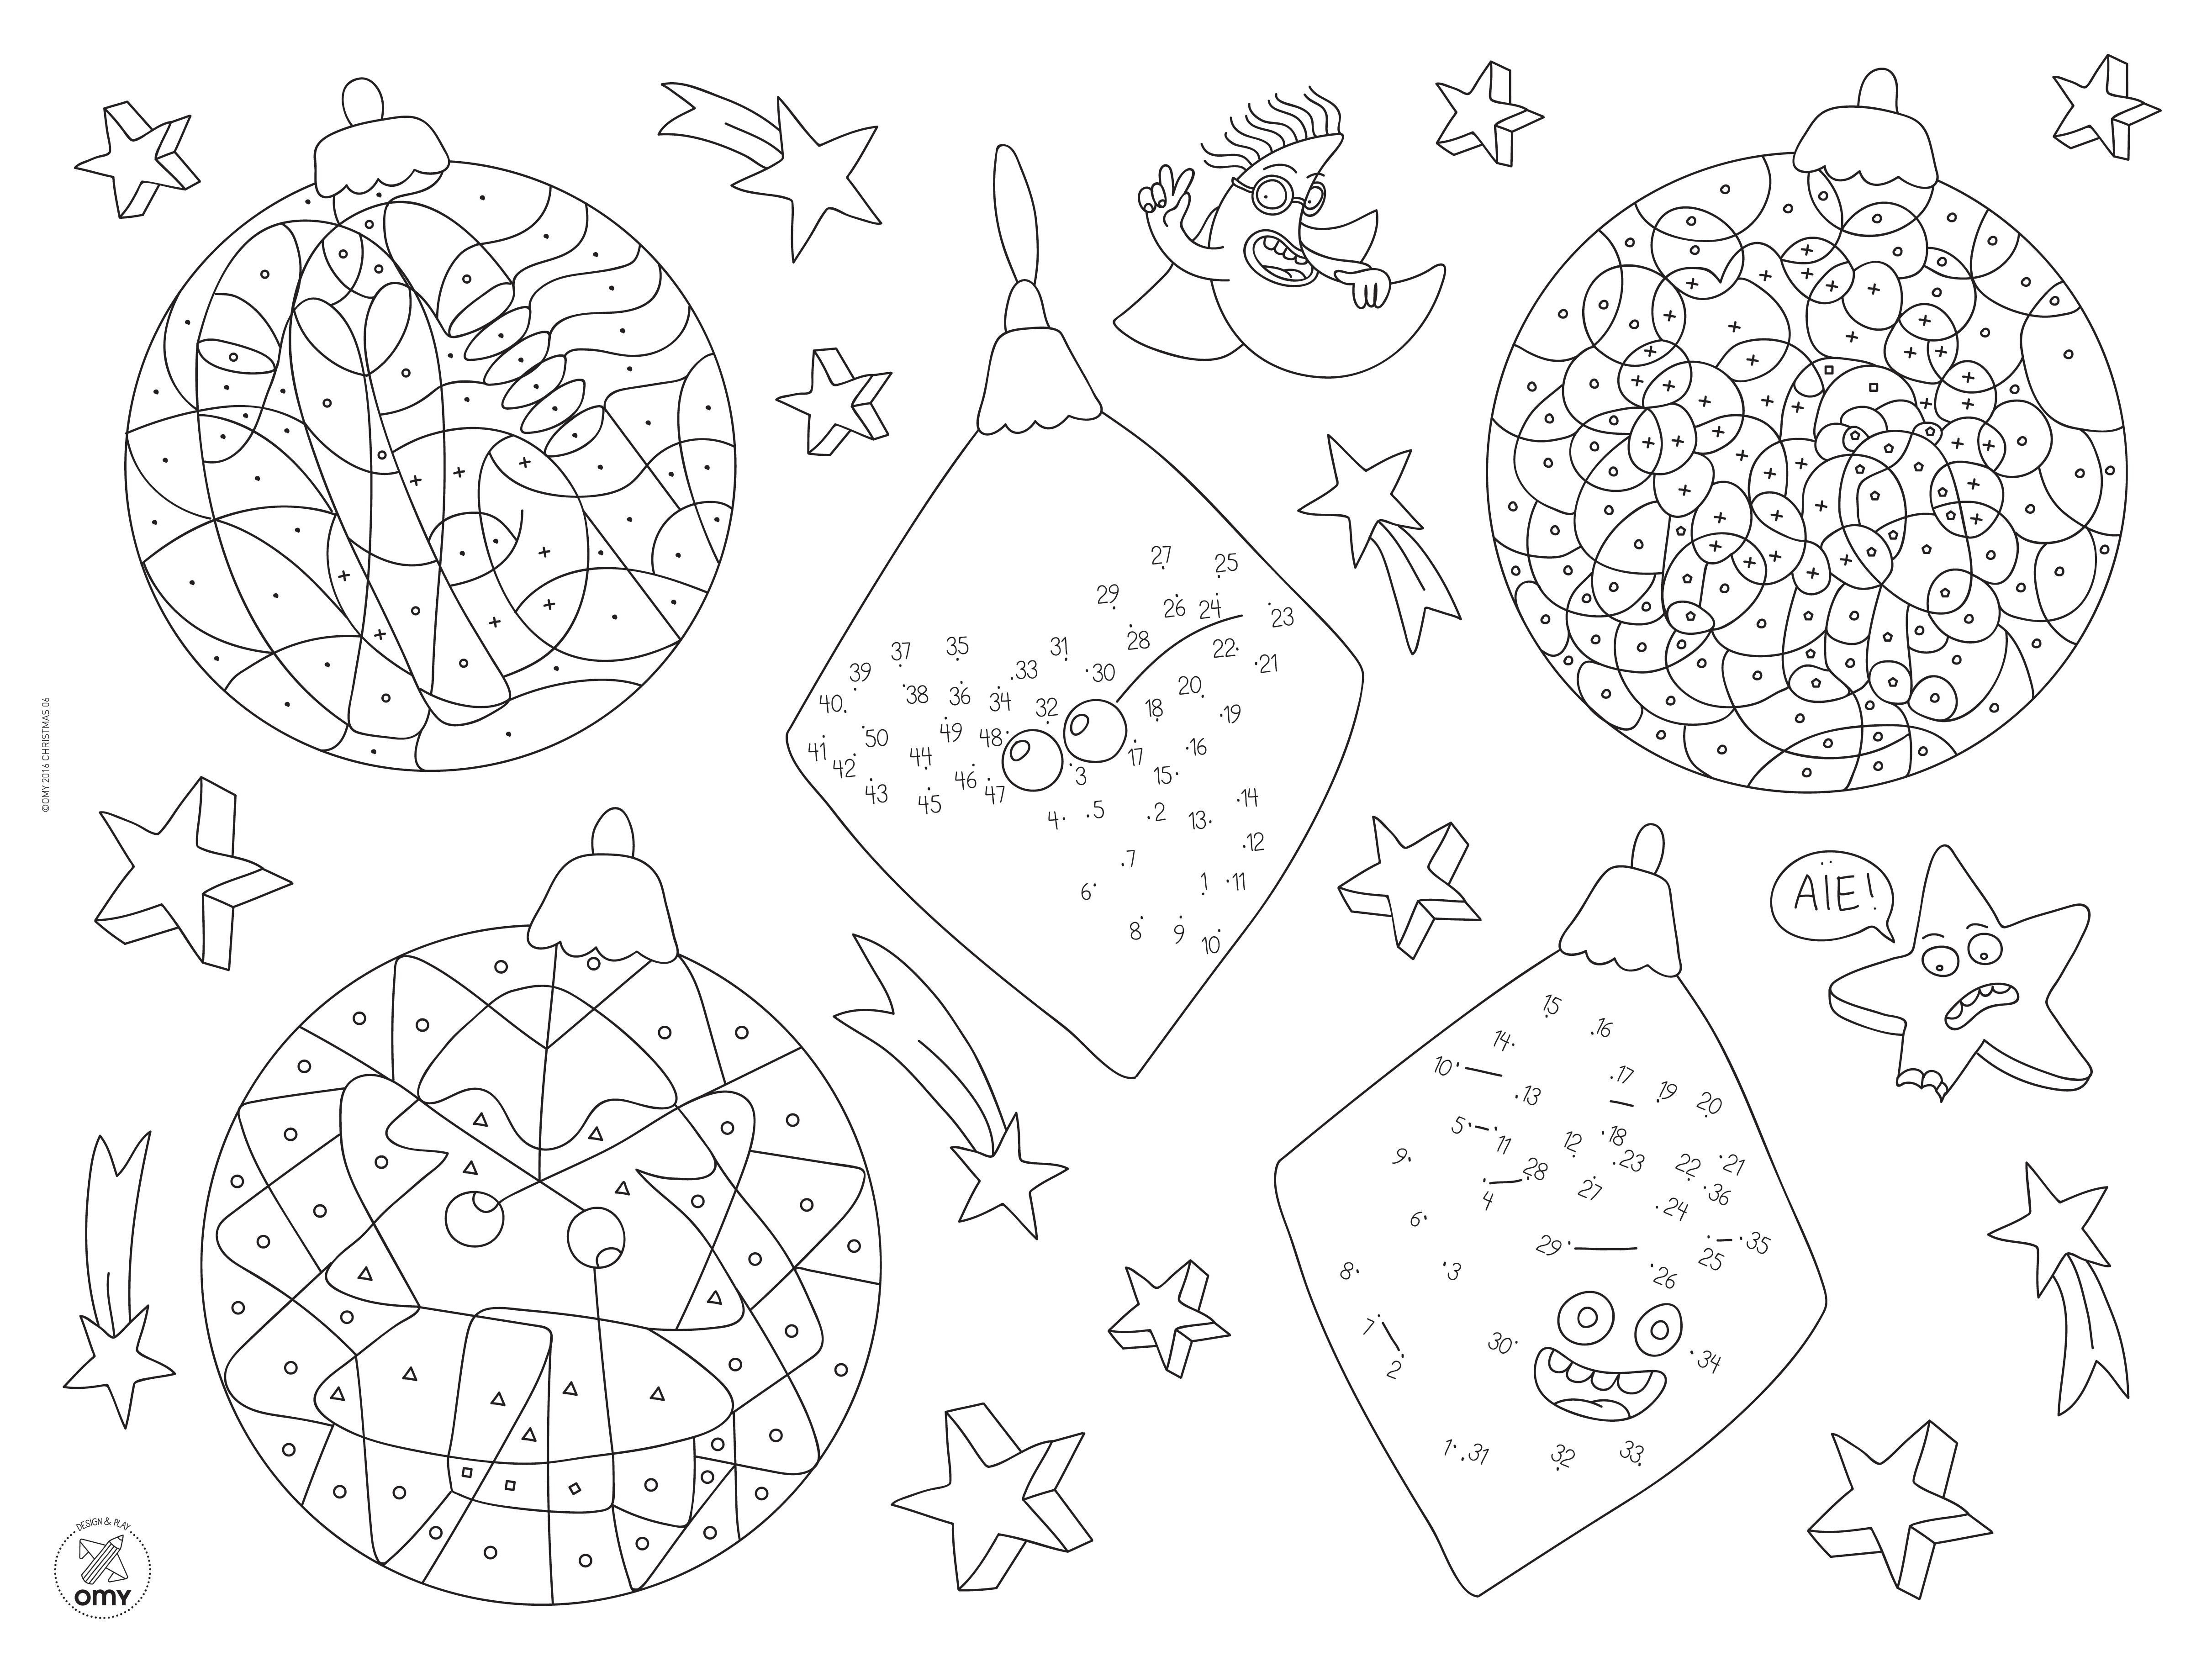 colouring mat set christmas by omy design  u0026 play  black